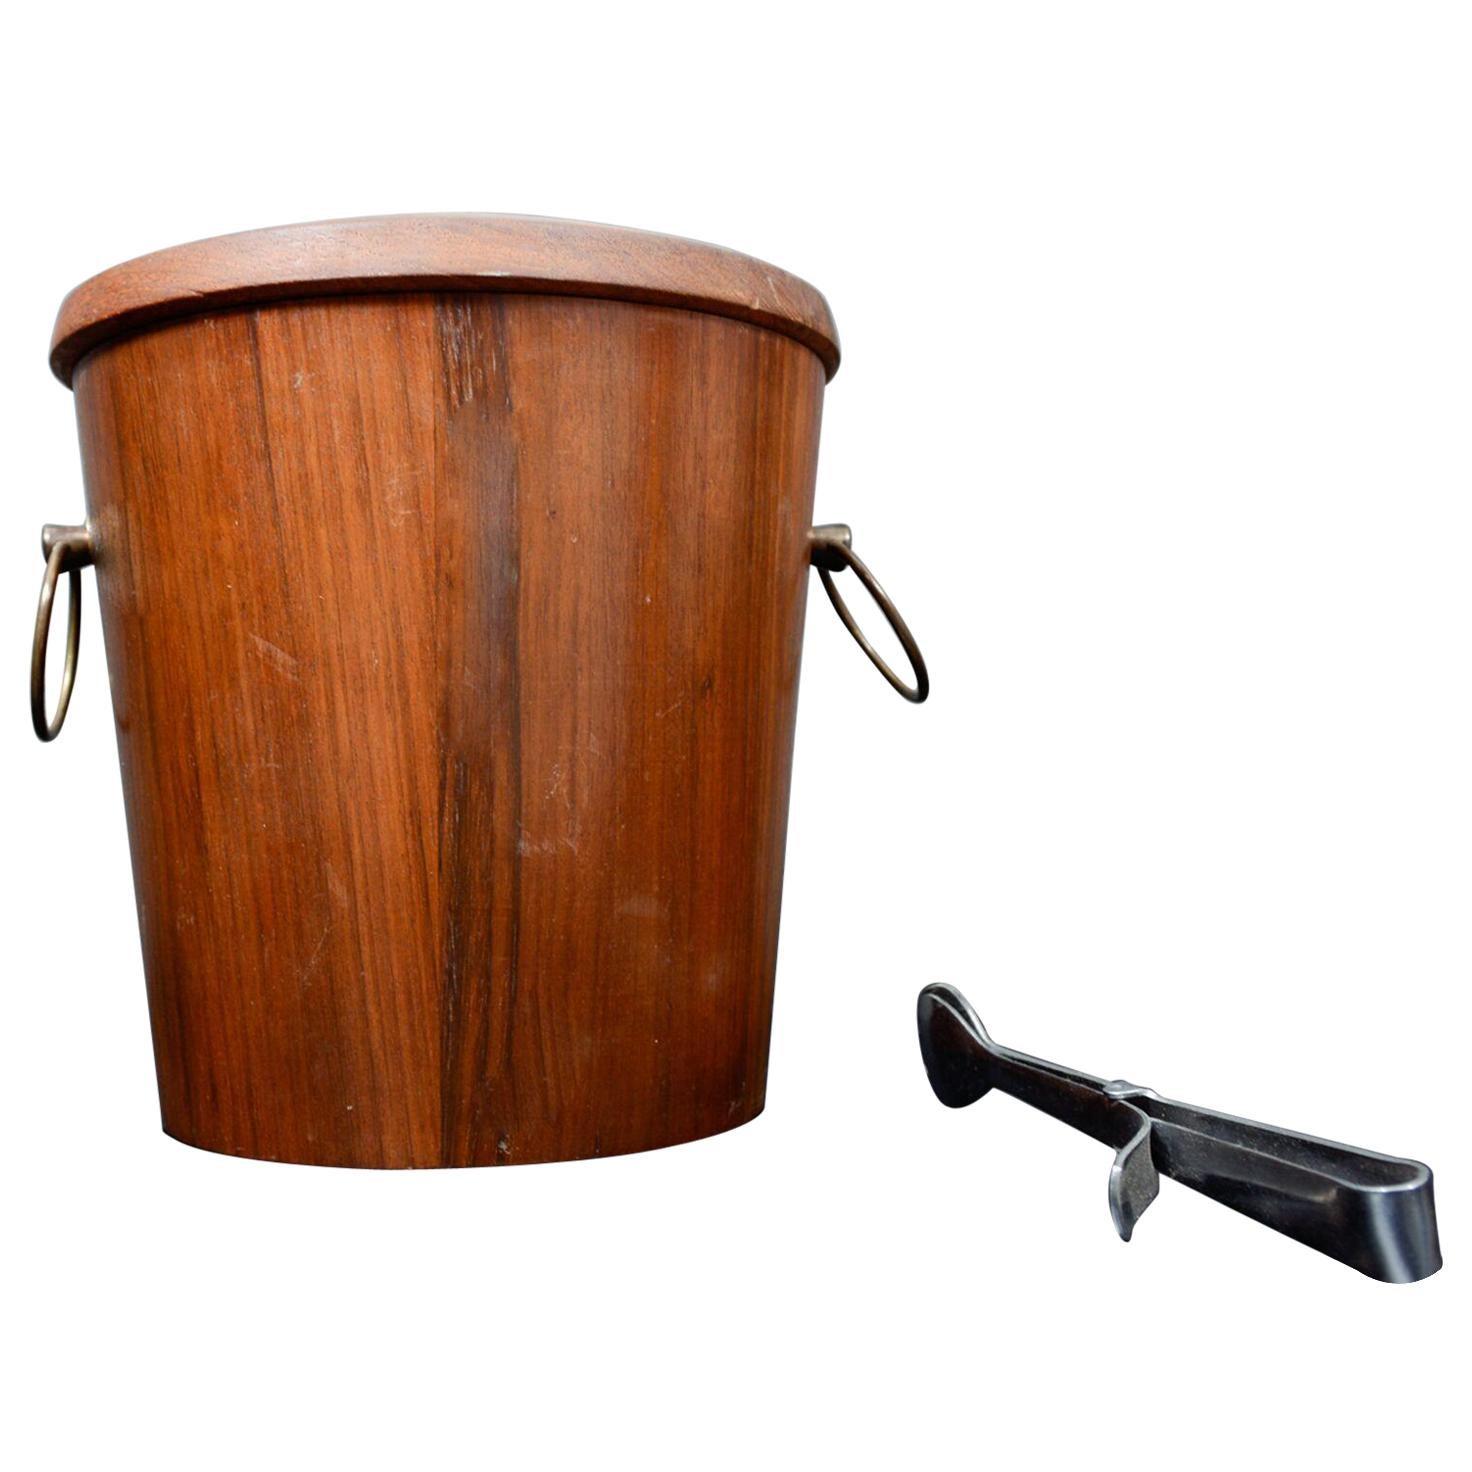 Mid-Century Modern Walnut Wood Ice Bucket with Stainless Steel Tongs 1960s